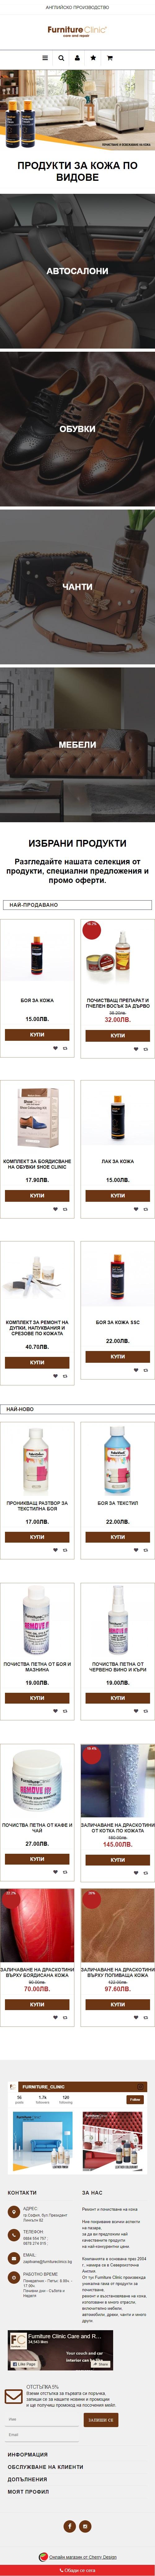 MobileDesign-FurnitureClinic-CherryAdv